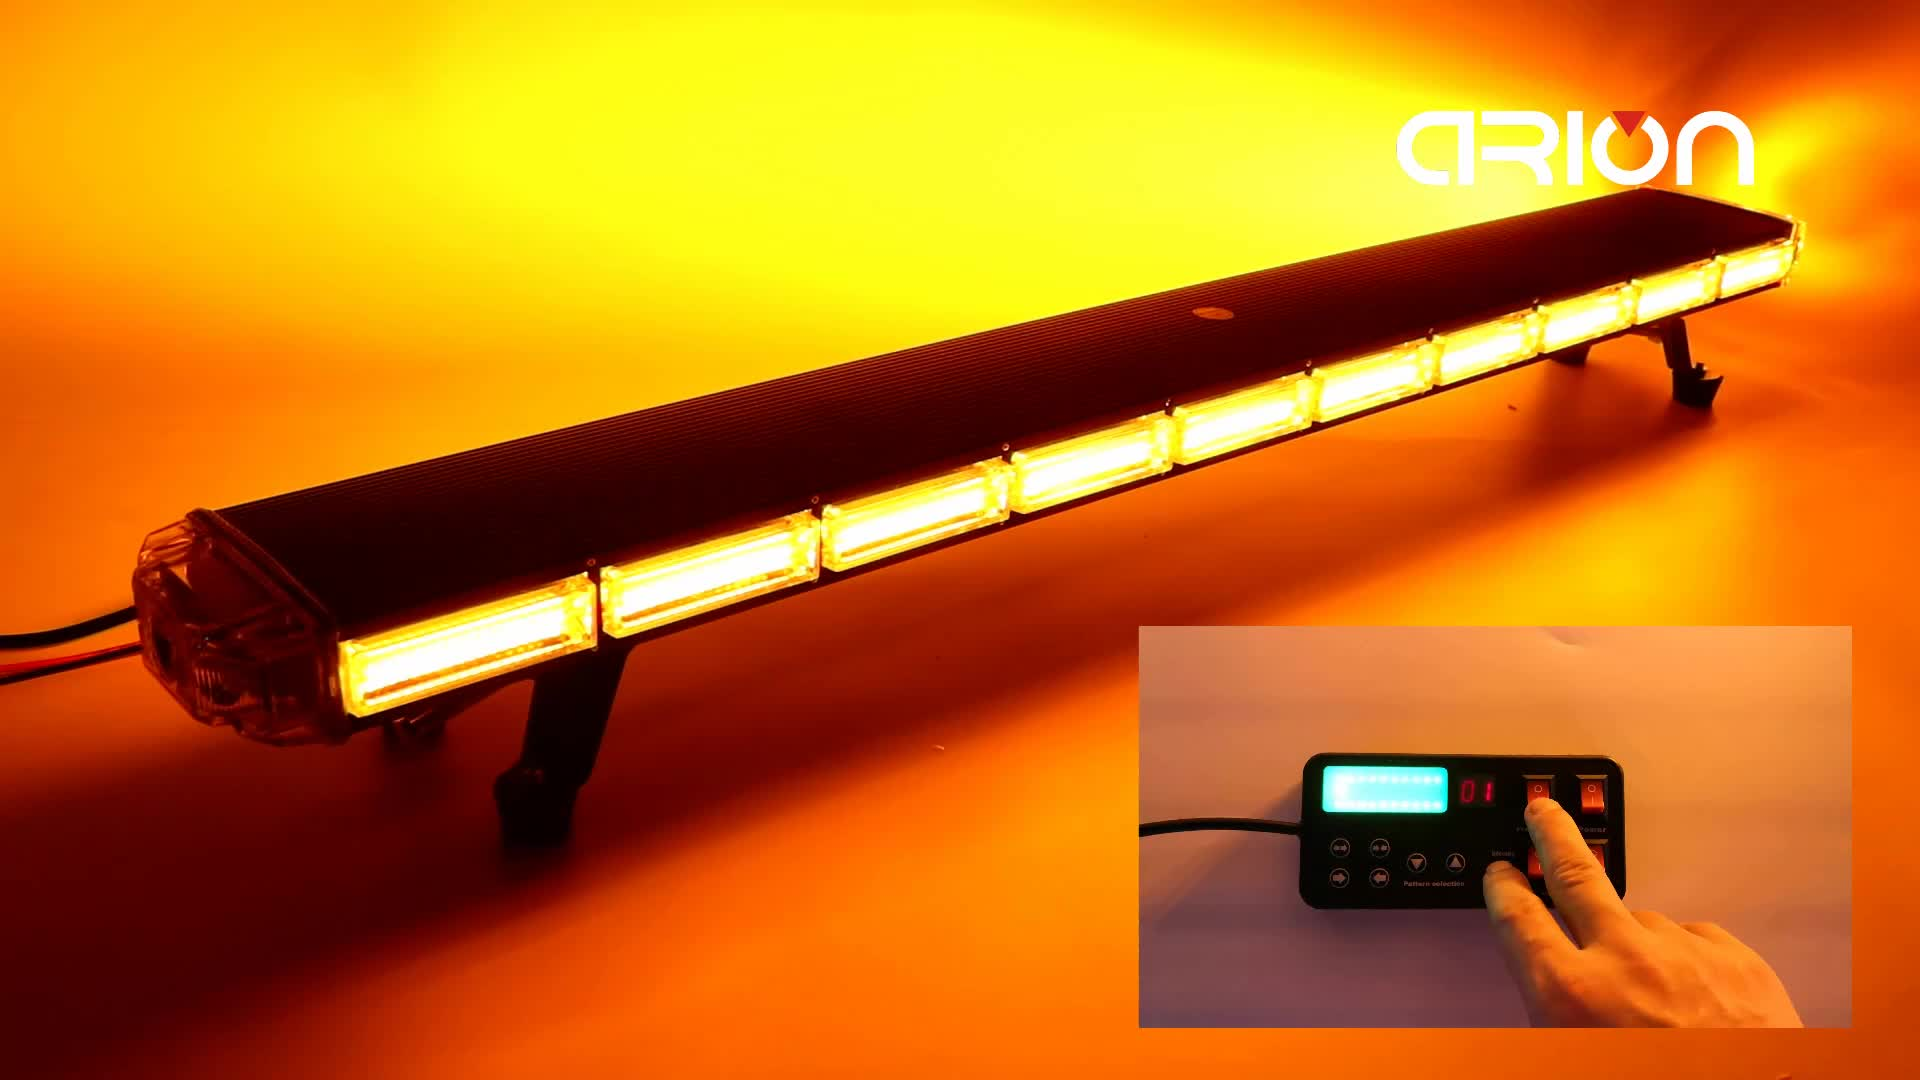 47 inch COB led strobe lights amber white red blue car truck emergency warning light bar 40 Flash modes